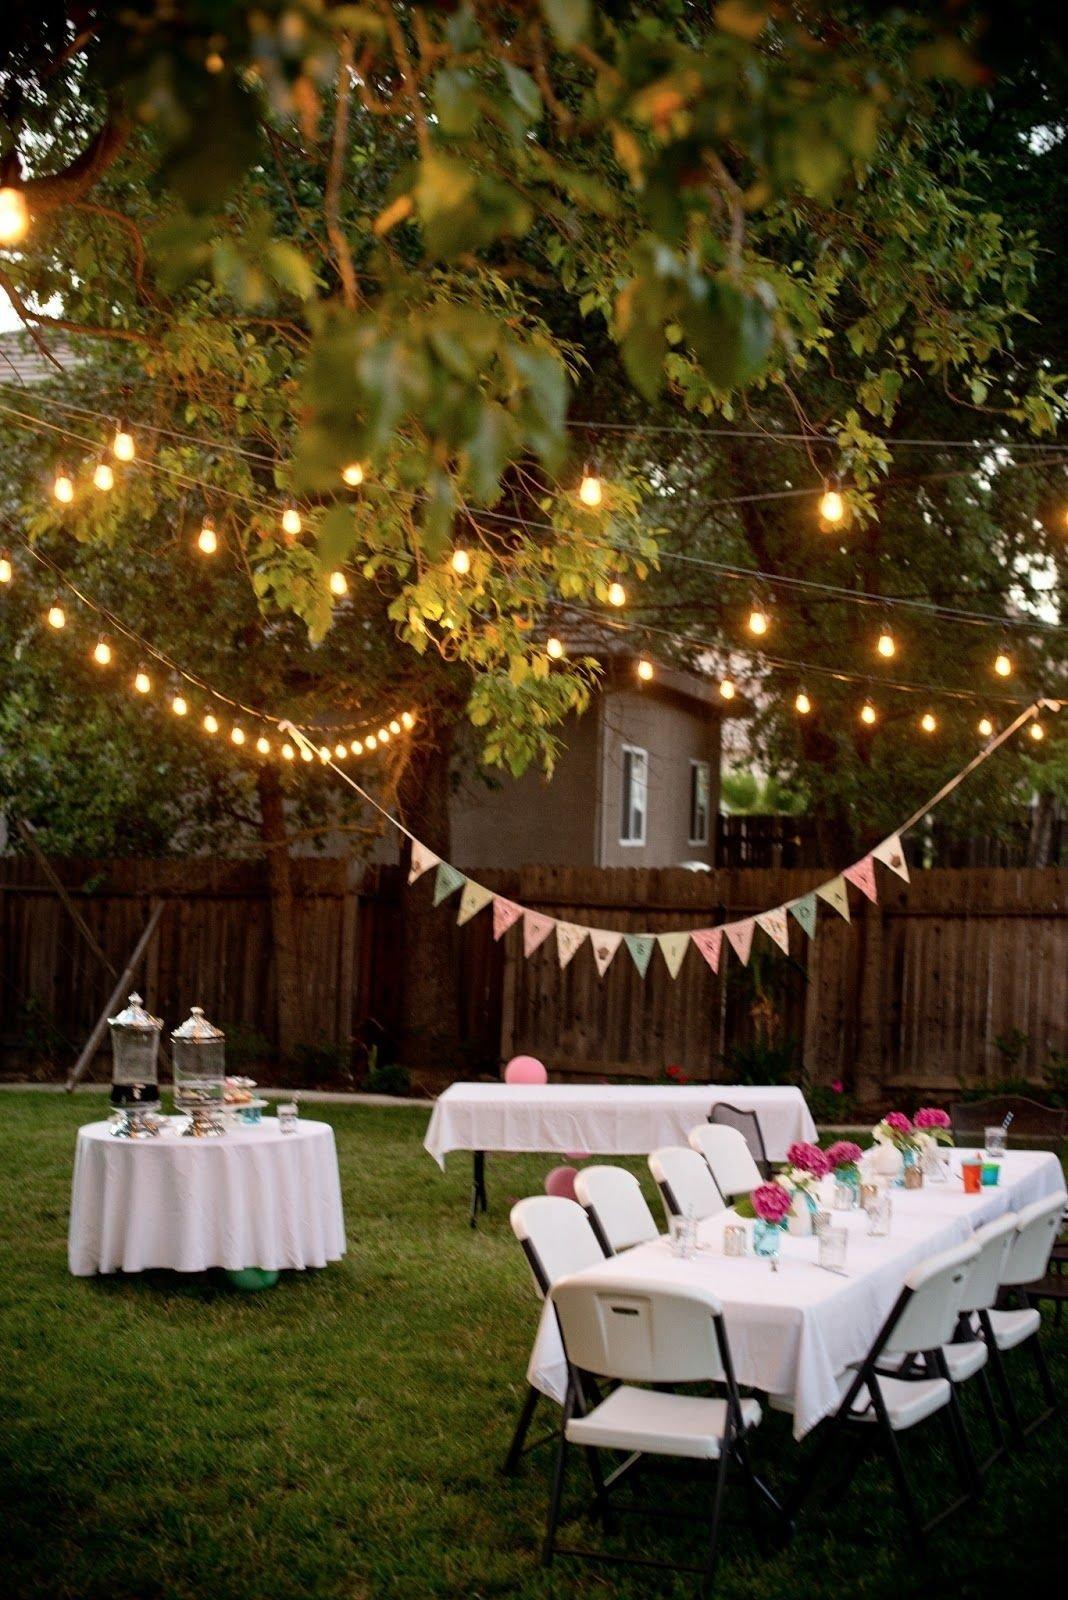 10 Stylish Backyard Birthday Party Ideas For Adults backyard birthday fun pink hydrangeas polka dot napkins